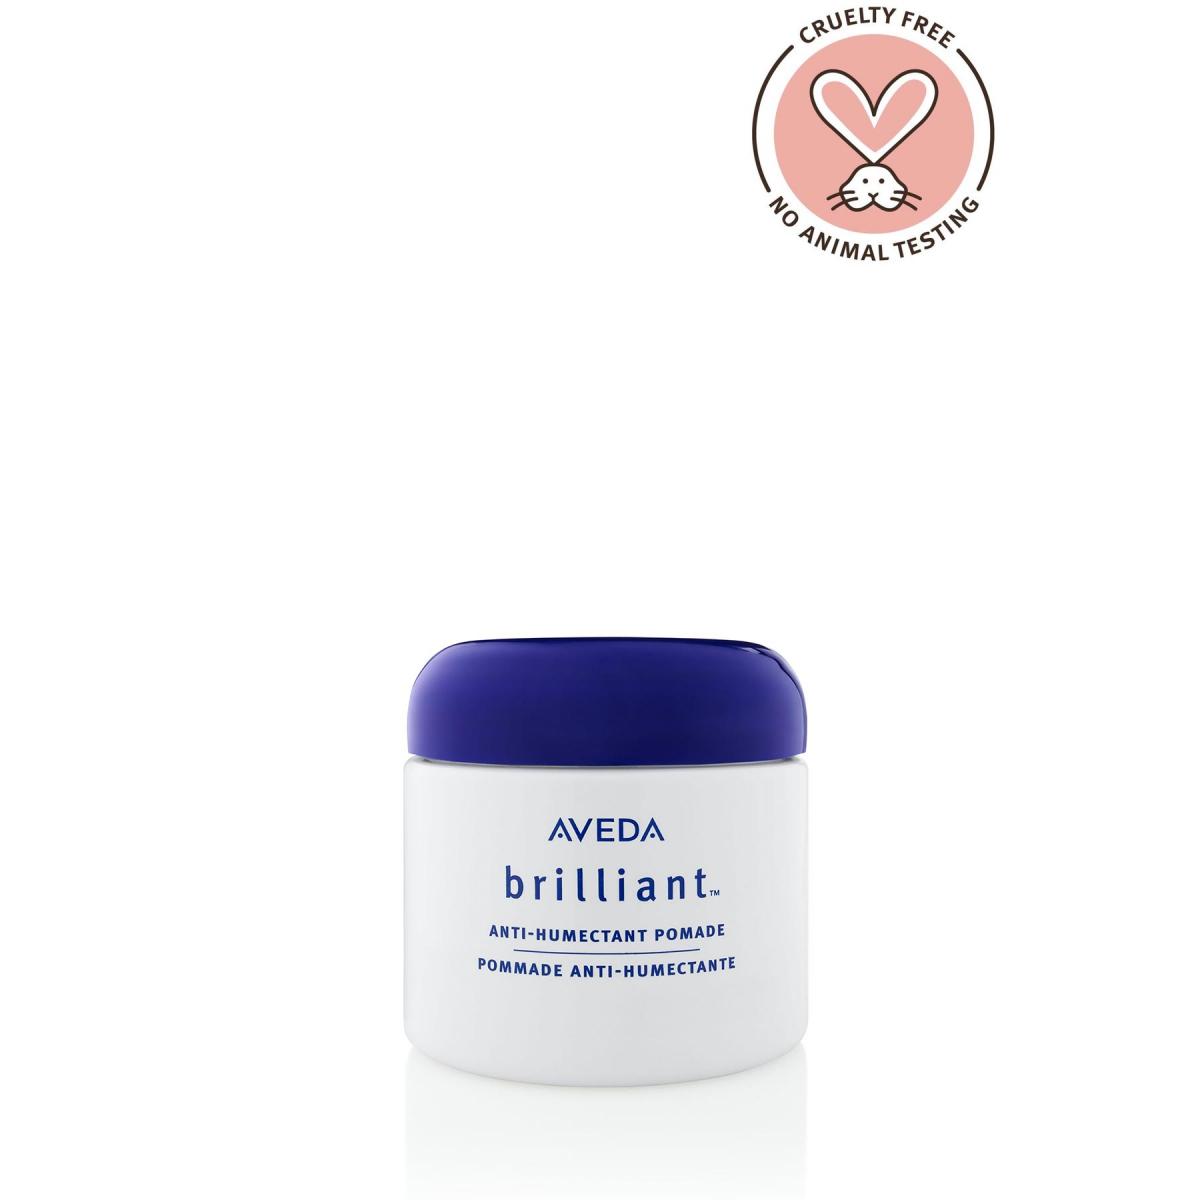 AVEDA Brilliant Elektriklenme Karşıtı Saç Pomadı 75 ml